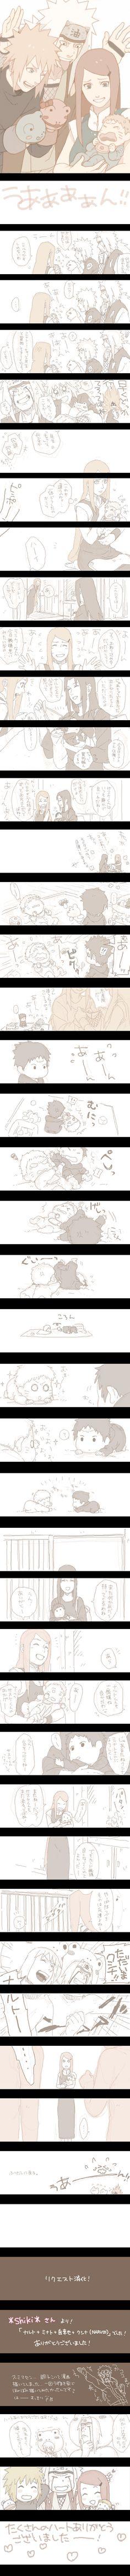 Baby Naruto, Kushina, Jiraiya, Minato, Mikoto, and baby Sasuke. <3 This is adorable, I wish I knew what they were saying.